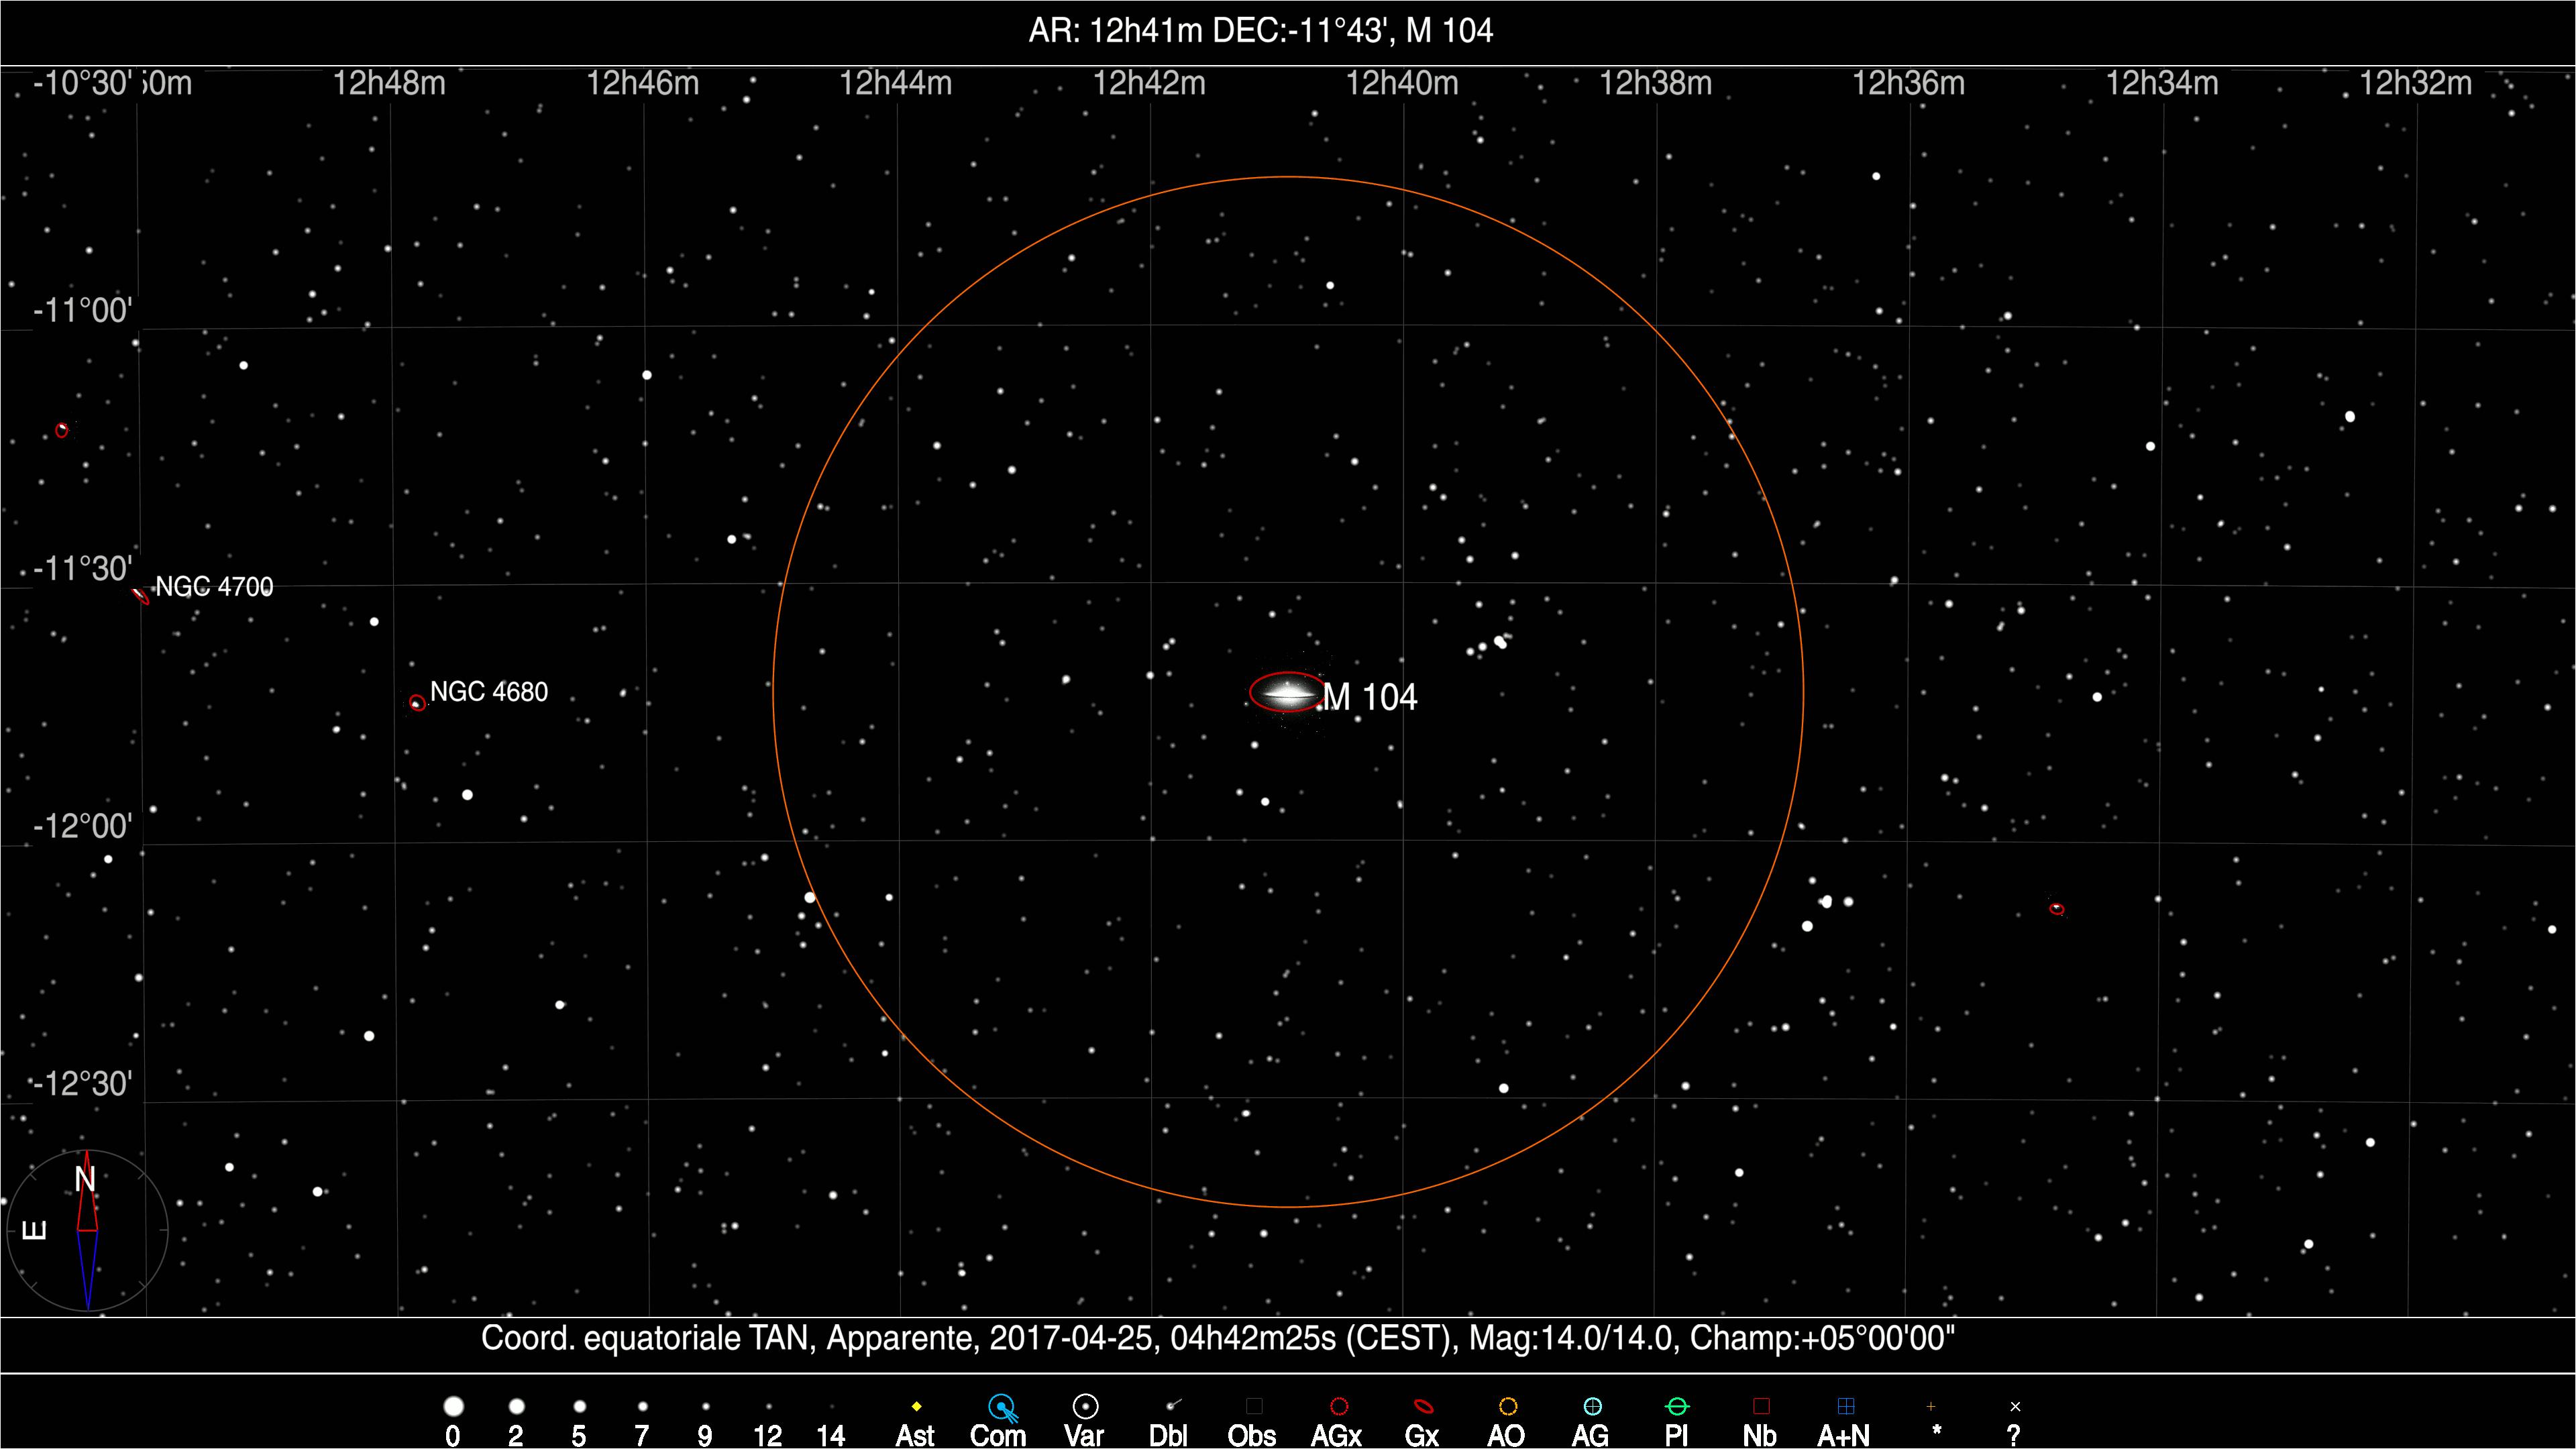 M104_5